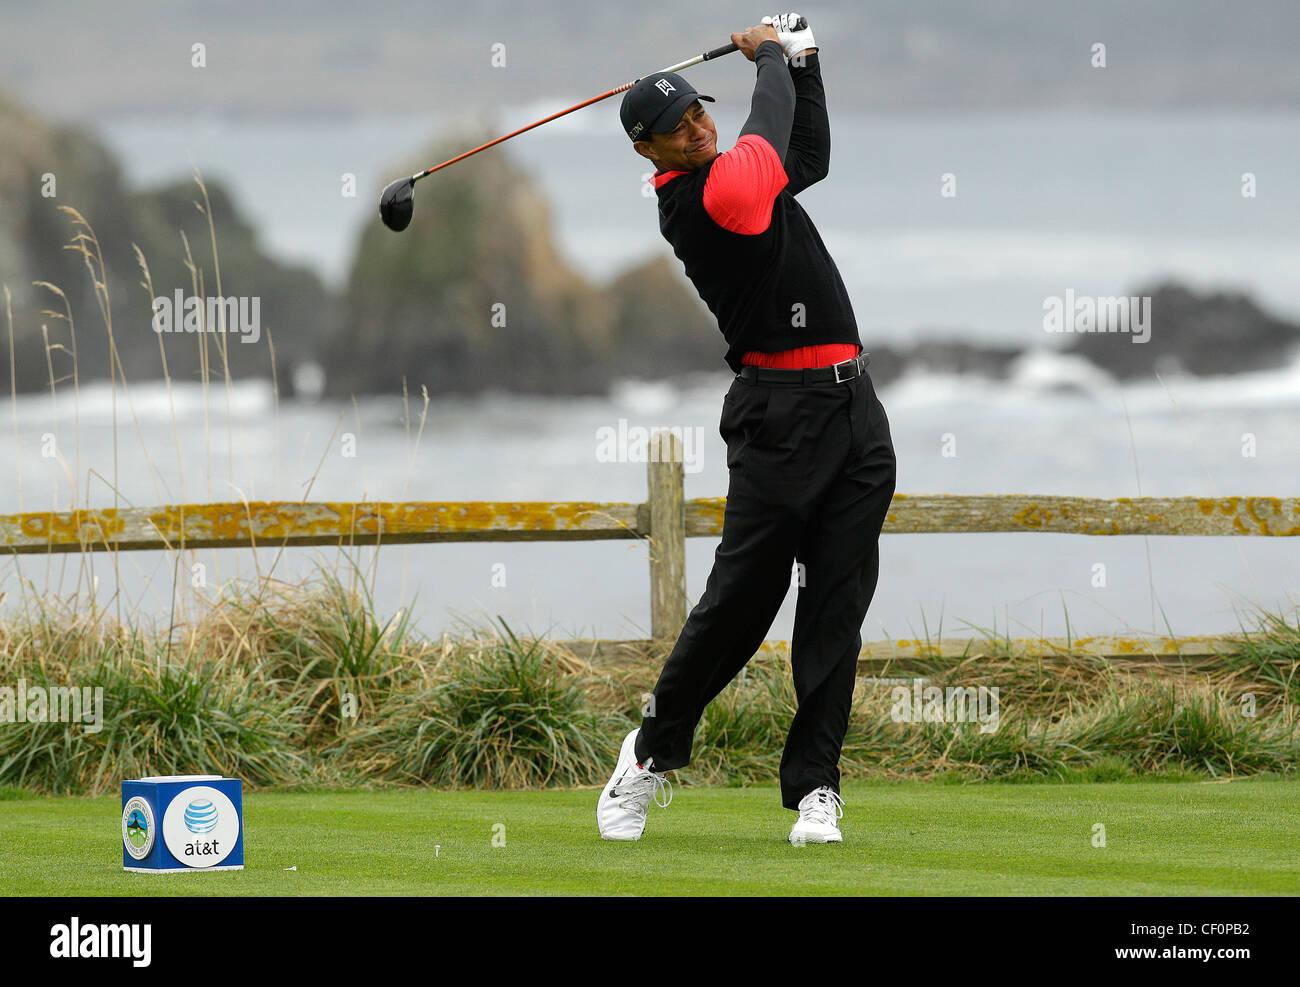 Tiger Woods Pga Golf Golfer Swing Club Pebble Beach Scenic